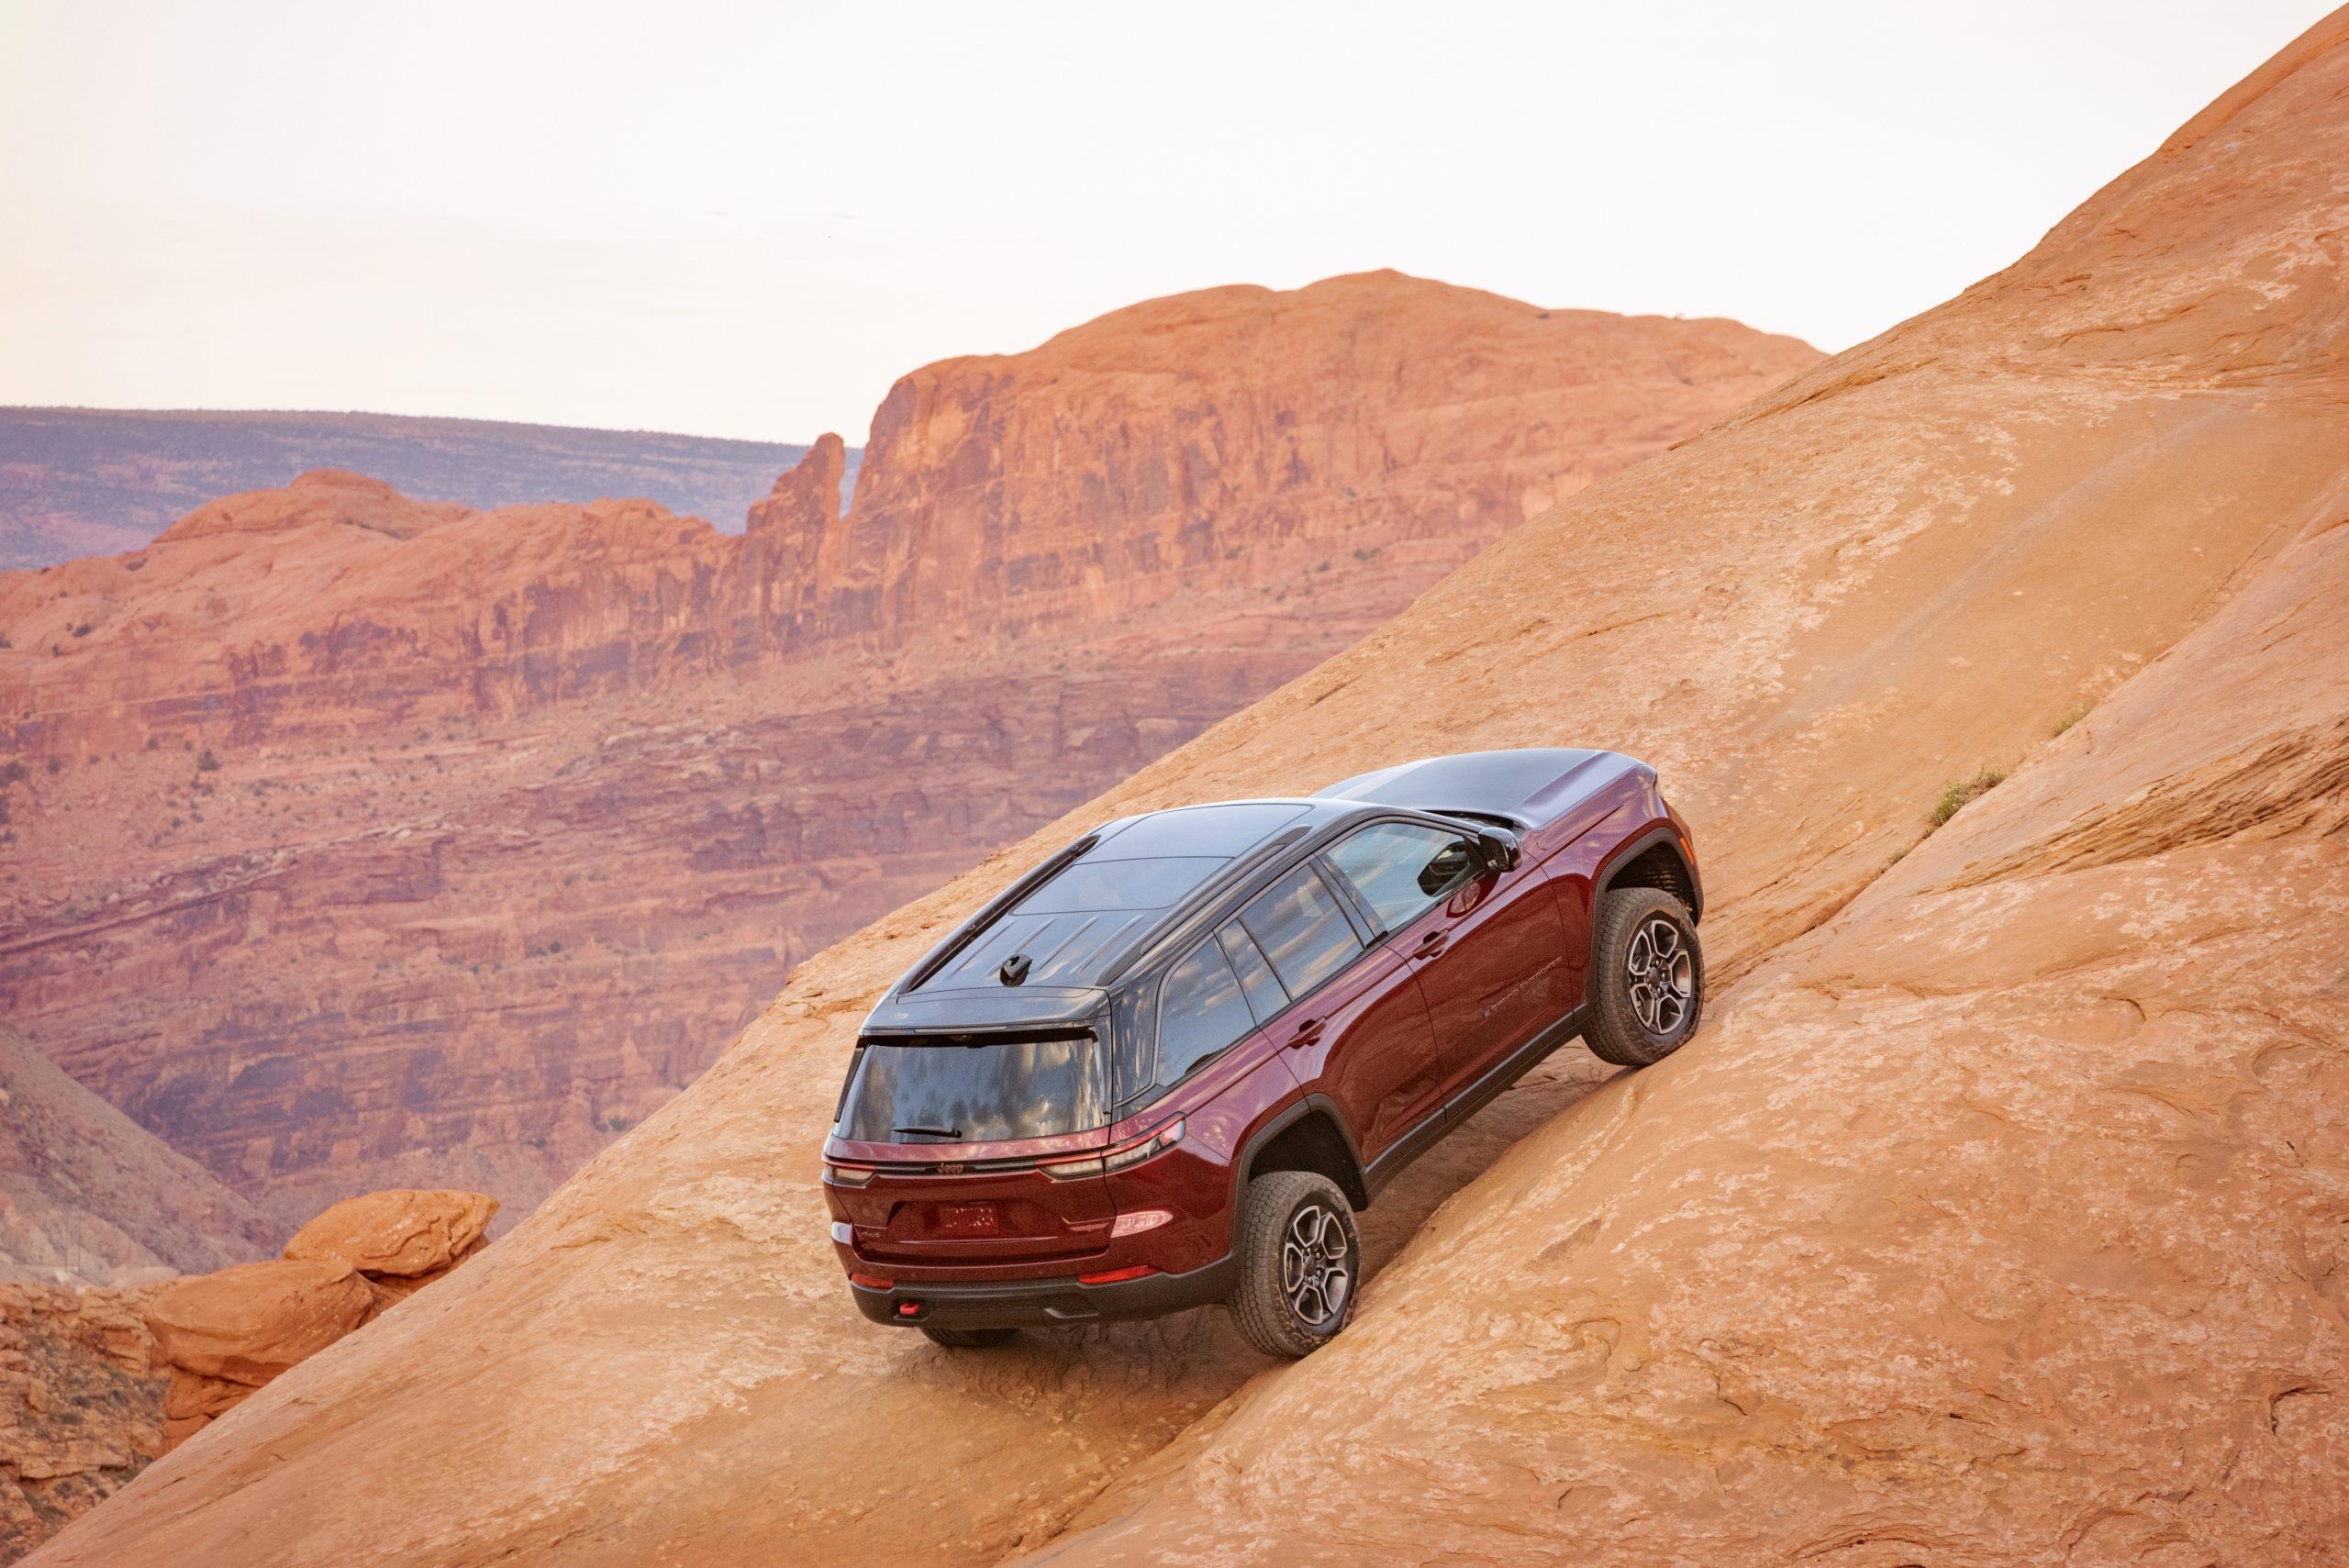 2022 Jeep Grand Cherokee Trailhawk climbing rock face